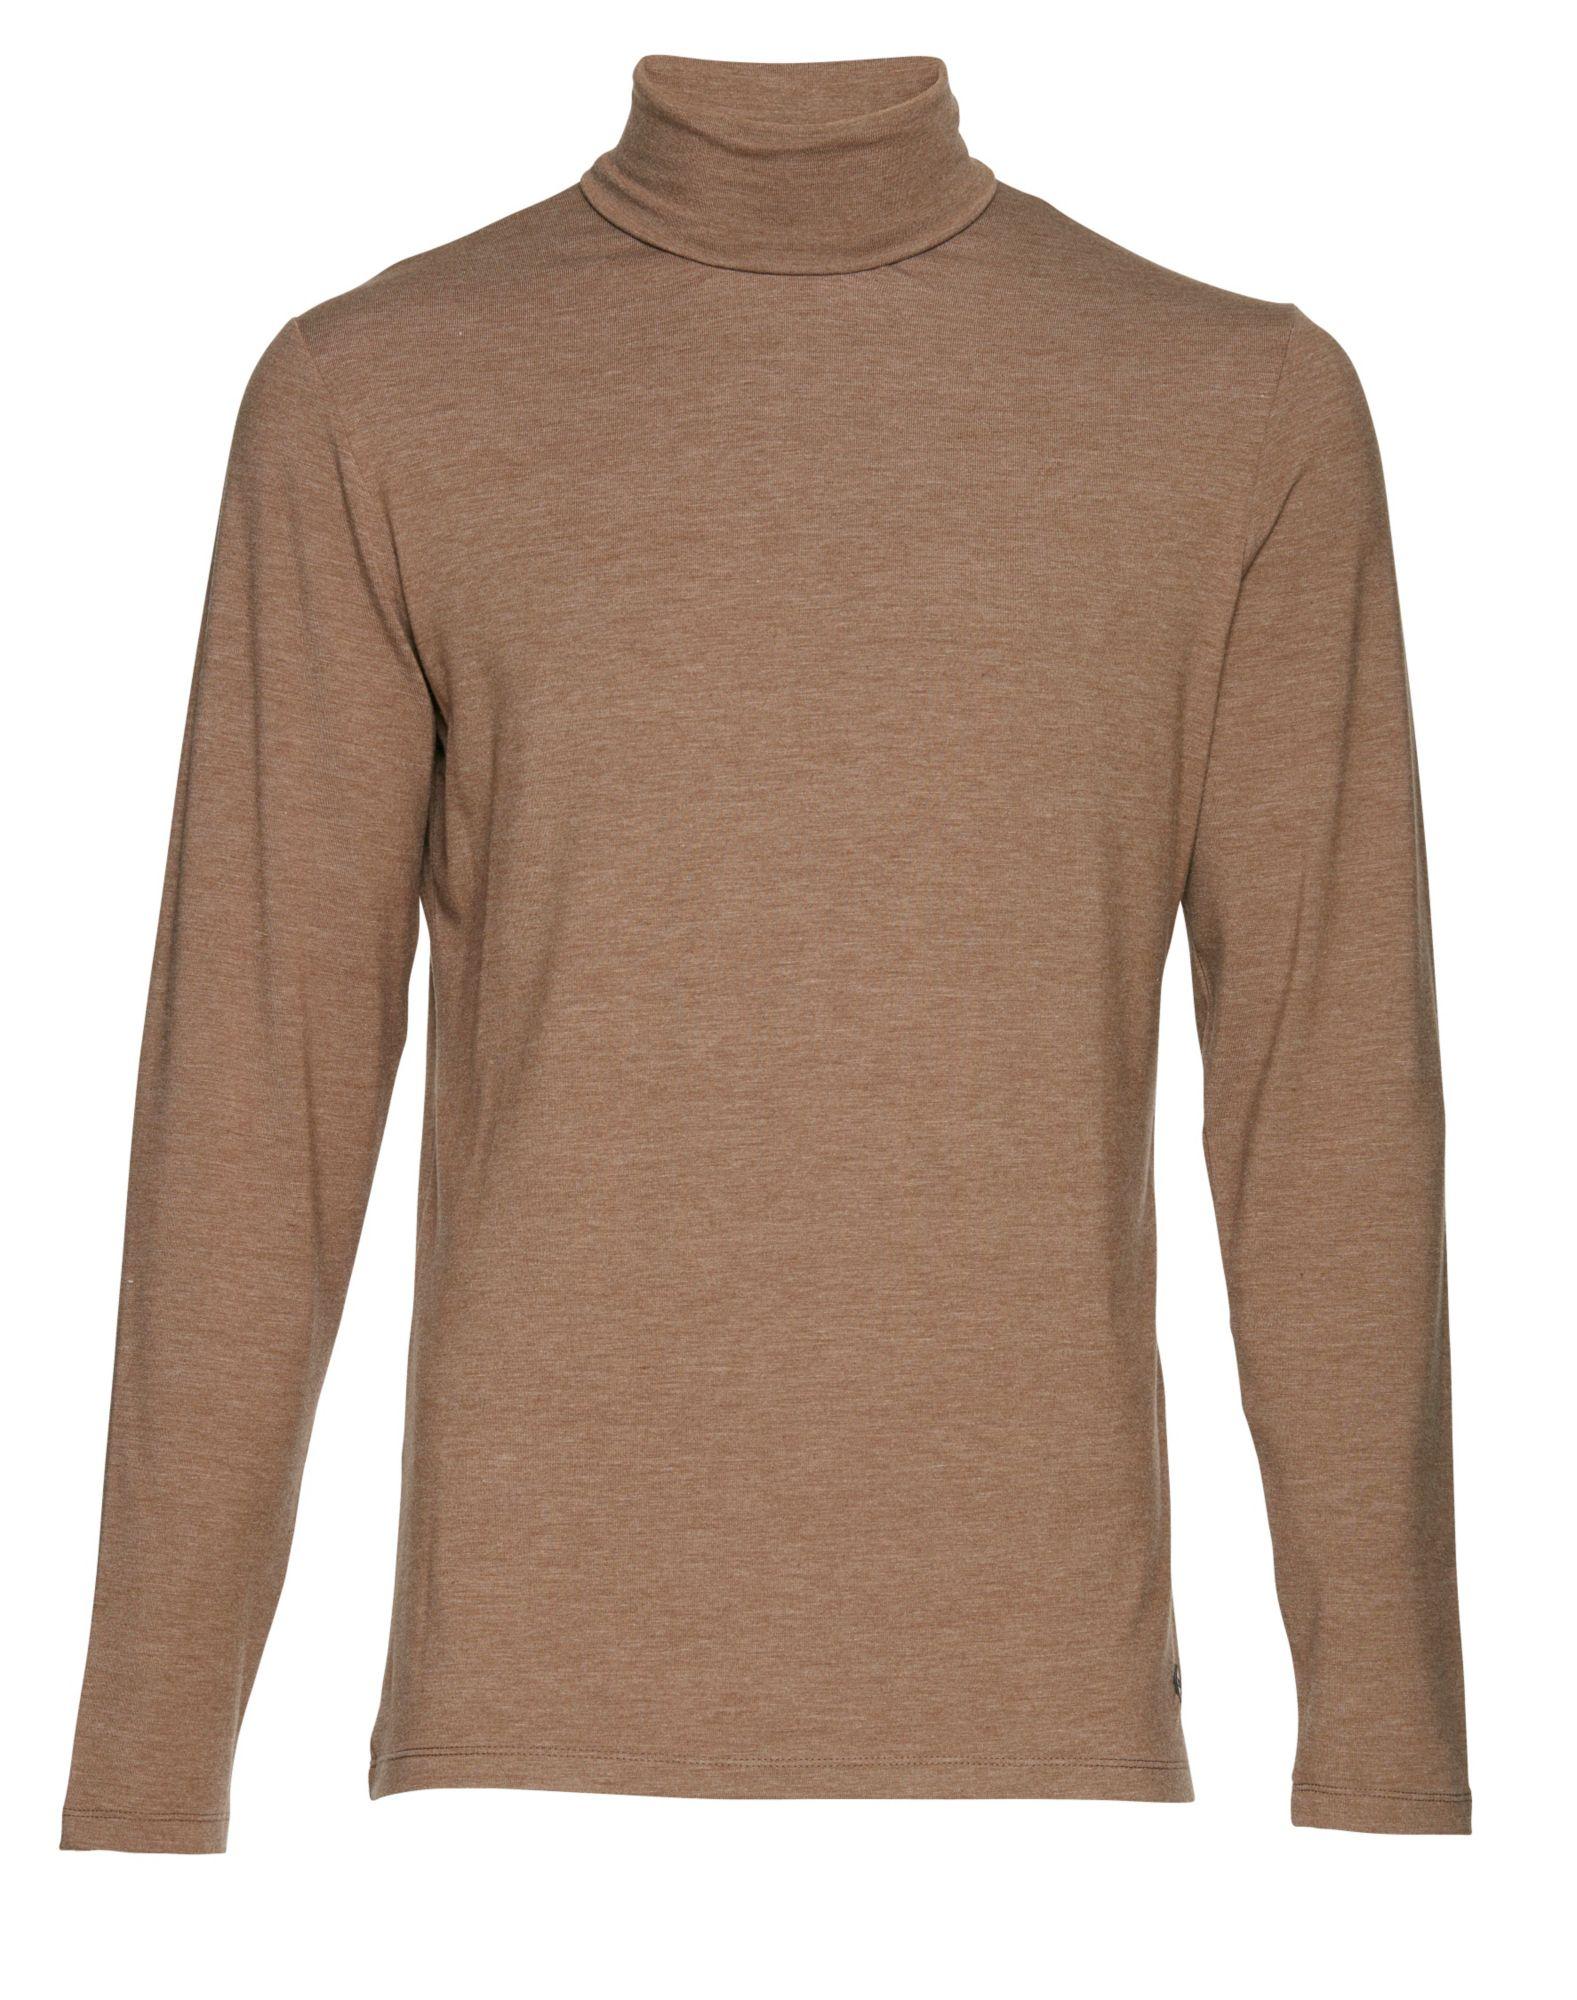 CASUAL FRIDAY Casual Friday T-Shirt langarm